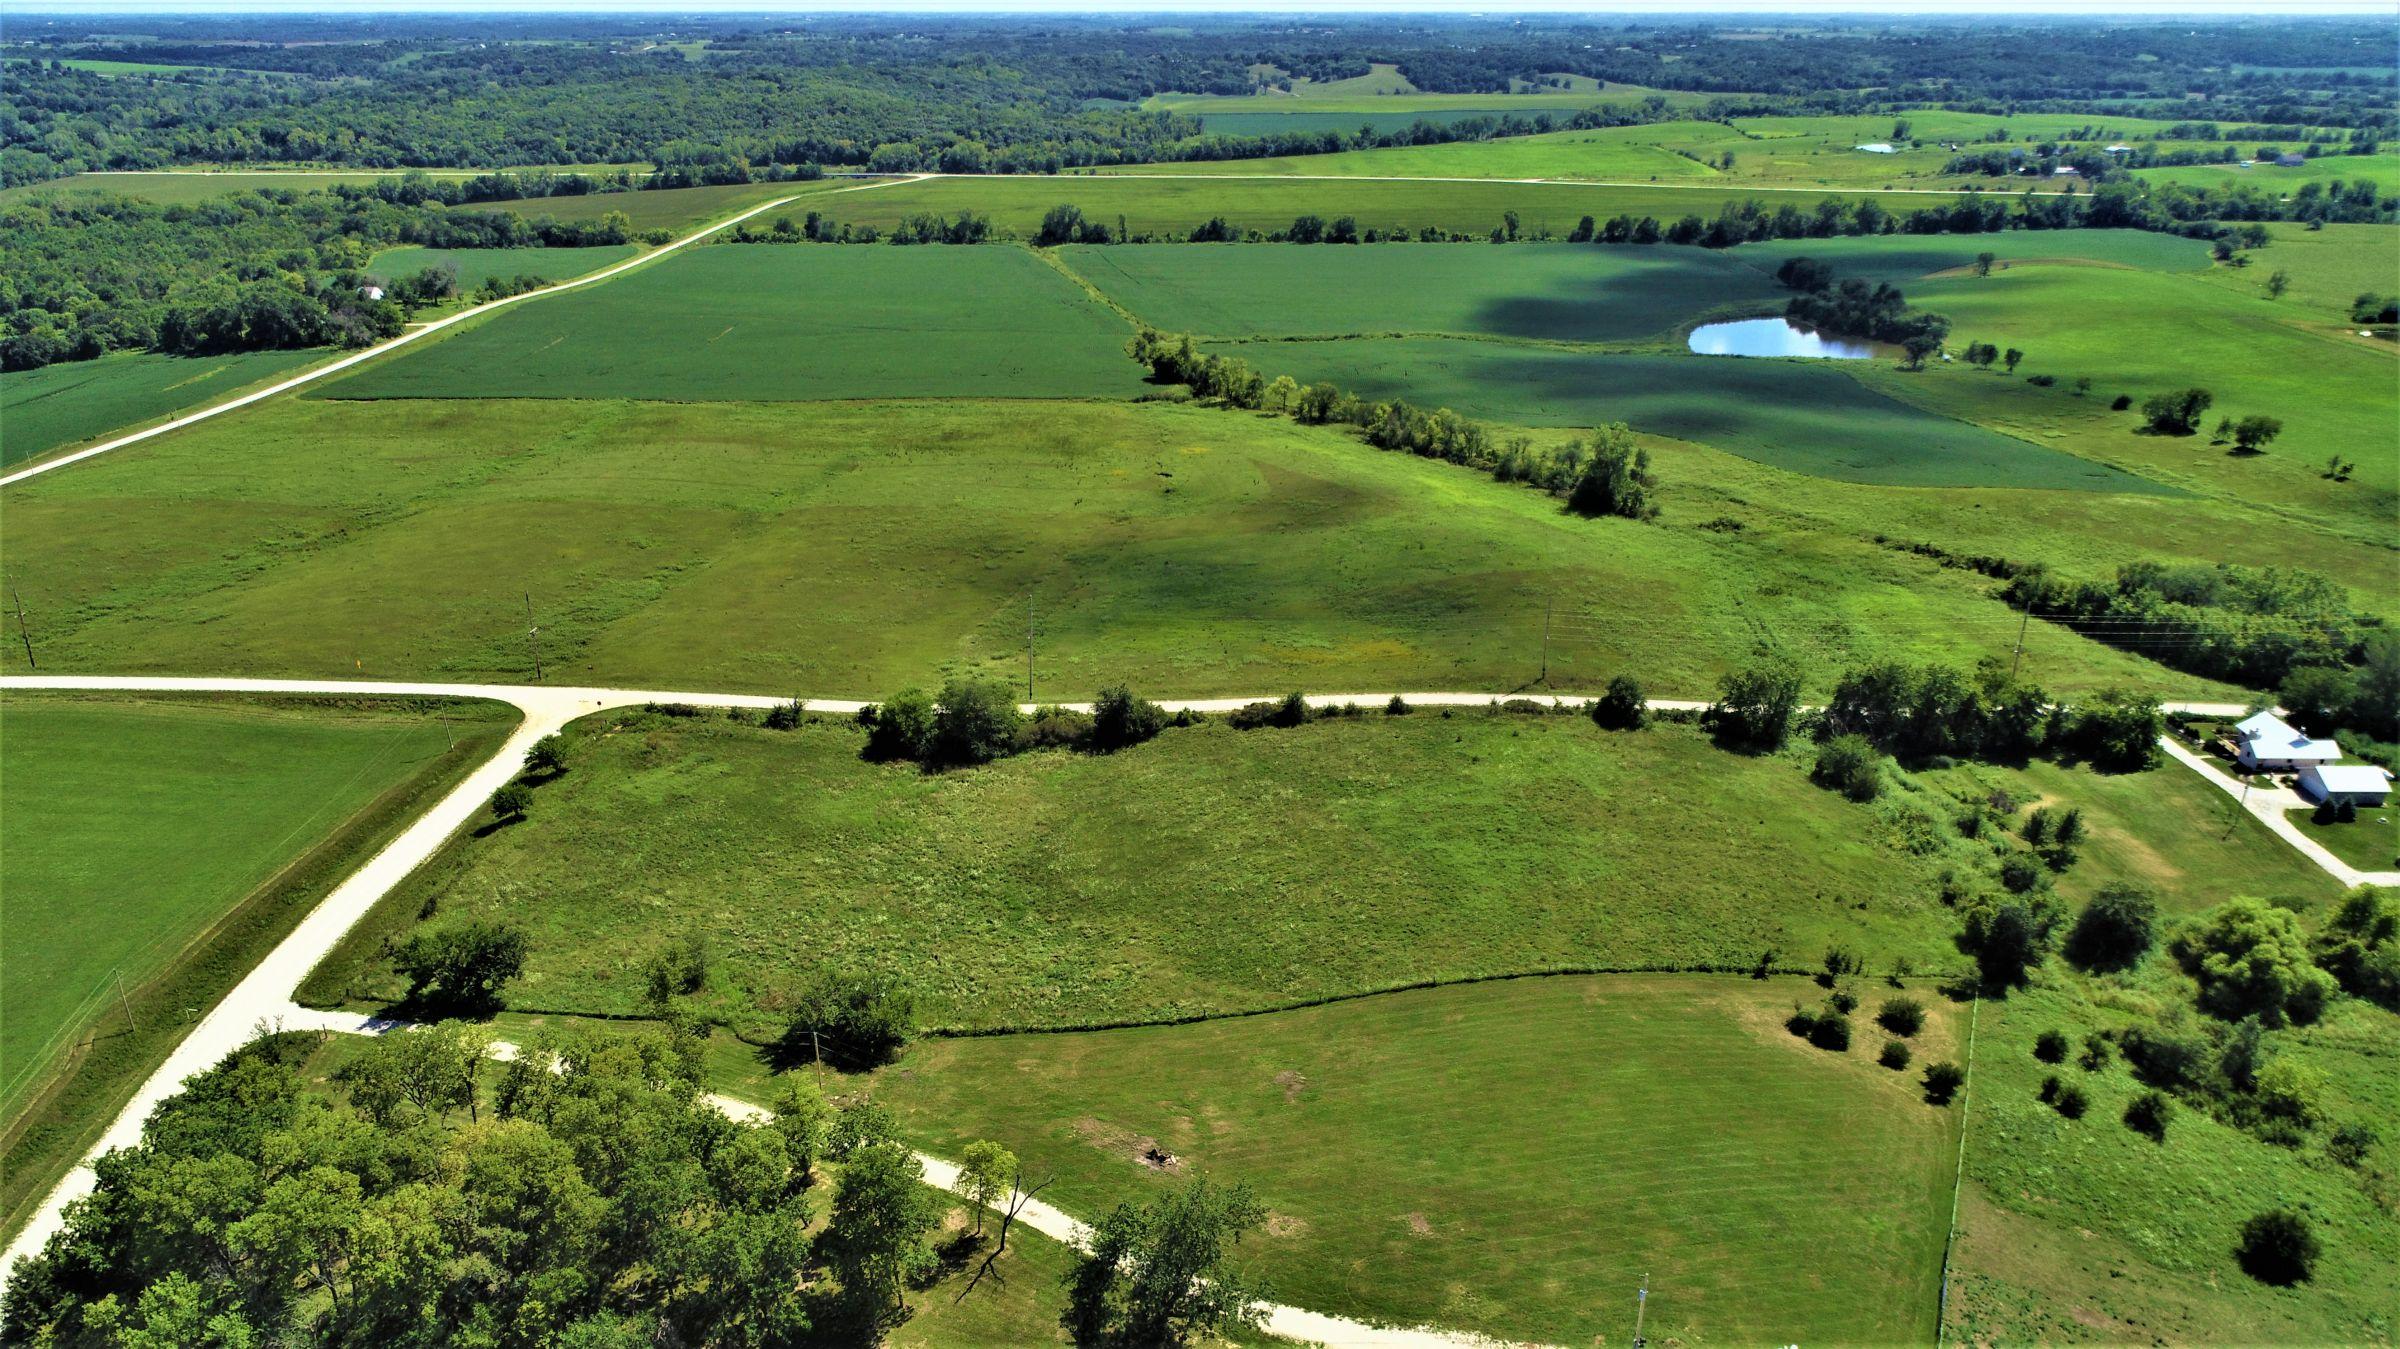 land-warren-county-iowa-6-acres-listing-number-15709-4-2021-08-27-202007.JPG